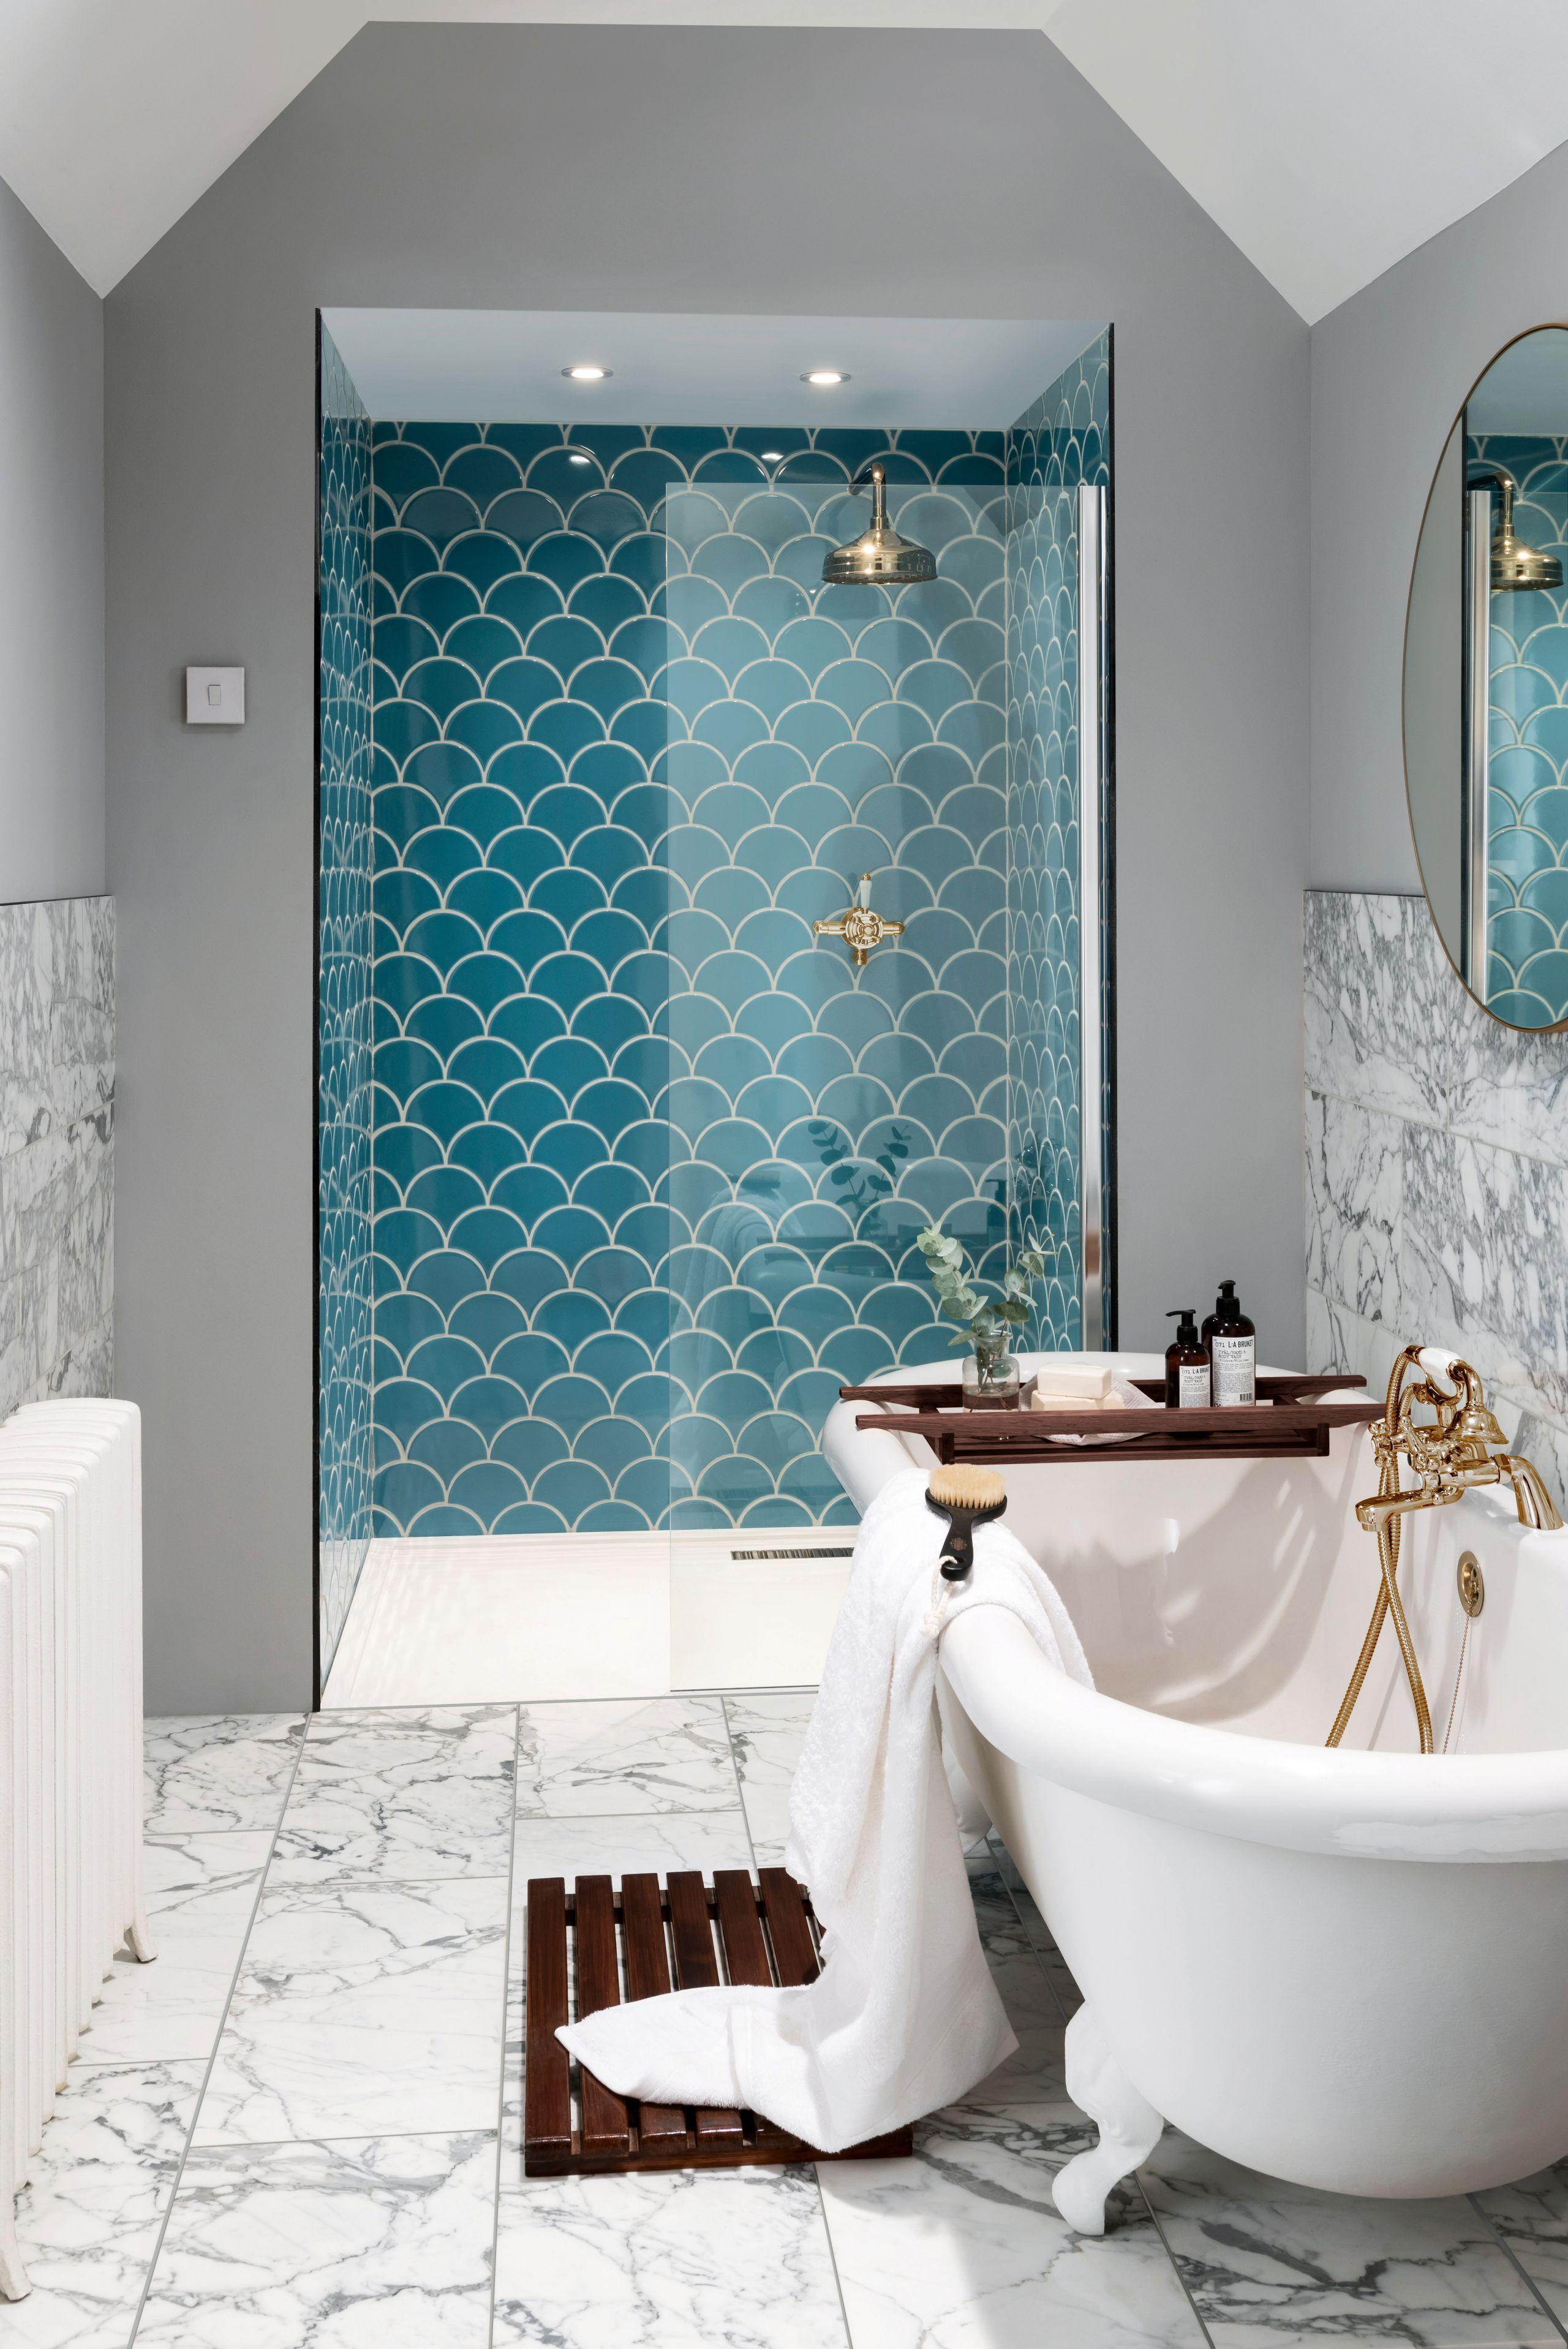 How To Add An En Suite Bathroom Bathroom Decor Bathroom Interior Bathroom Interior Design